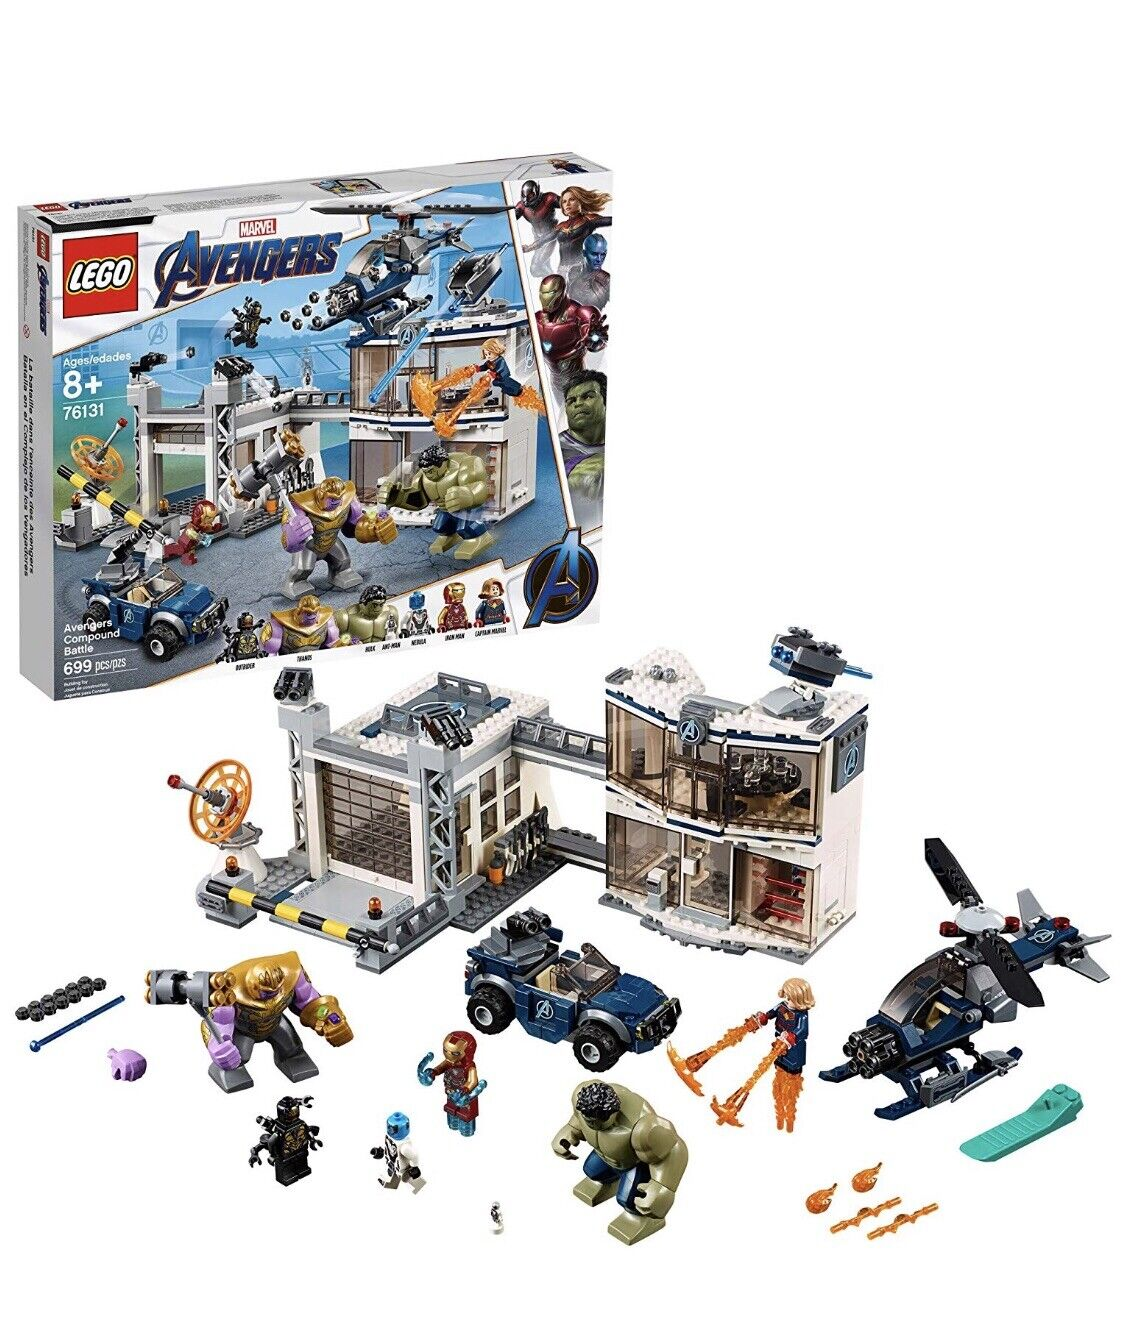 LEGO marvel avengers endgame sets-76131 Building Kit, New 2019 (699 Pieces)